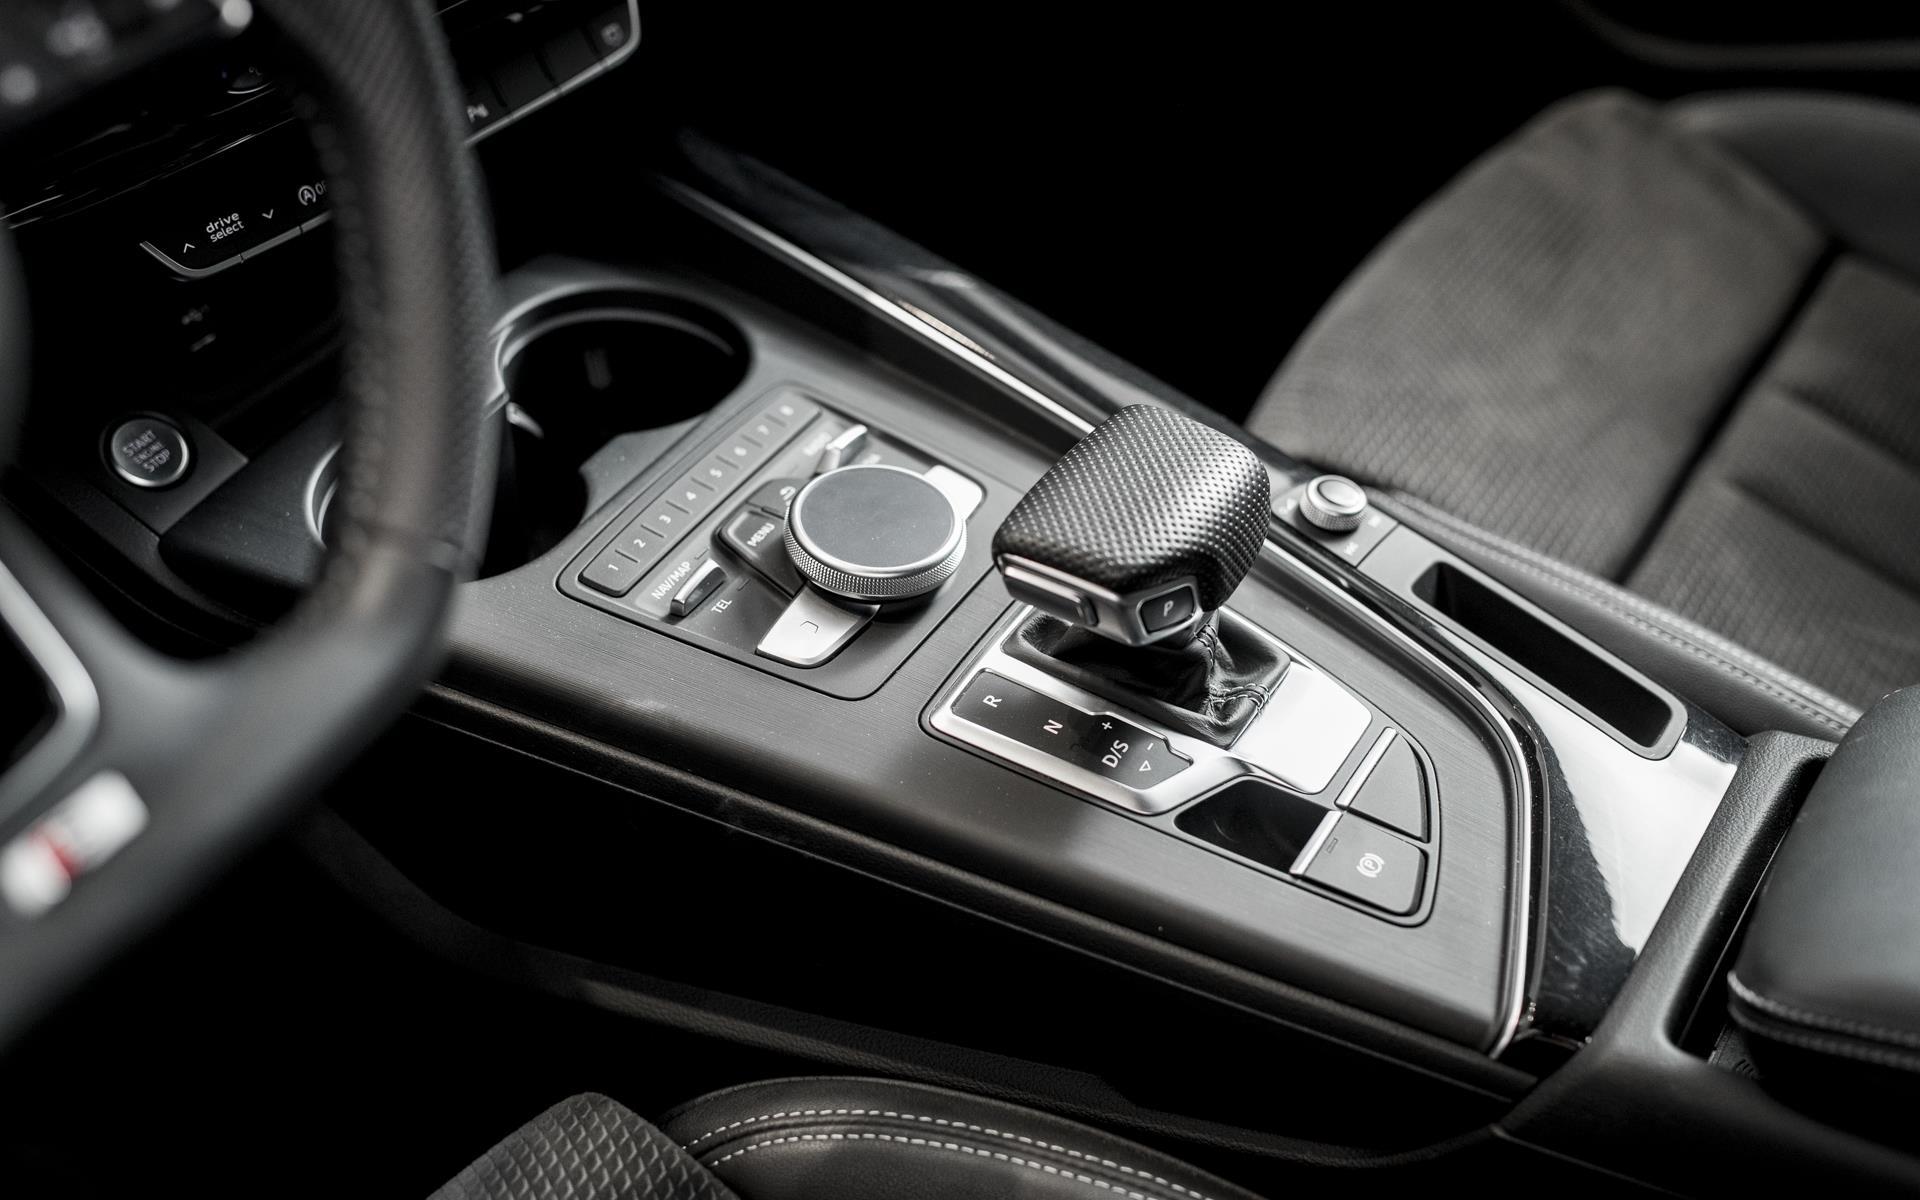 Avant 2,0 TDI S-Line Black Edition TipTronic 190HK Stc  image6